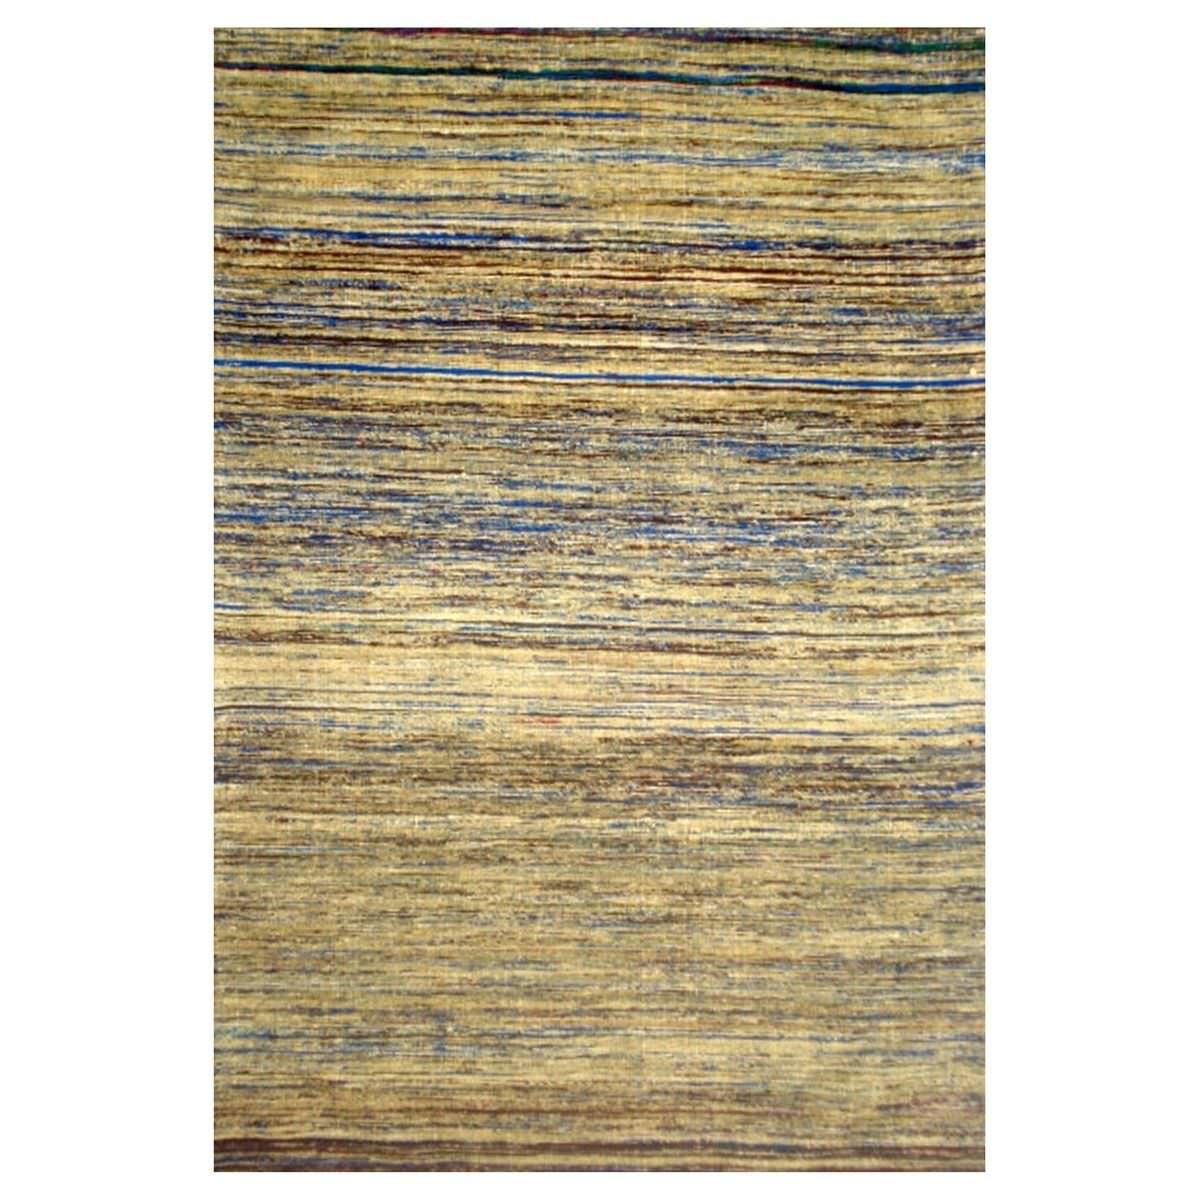 Chocho Handwoven Sari Silk Rug, 280x190cm, Beige